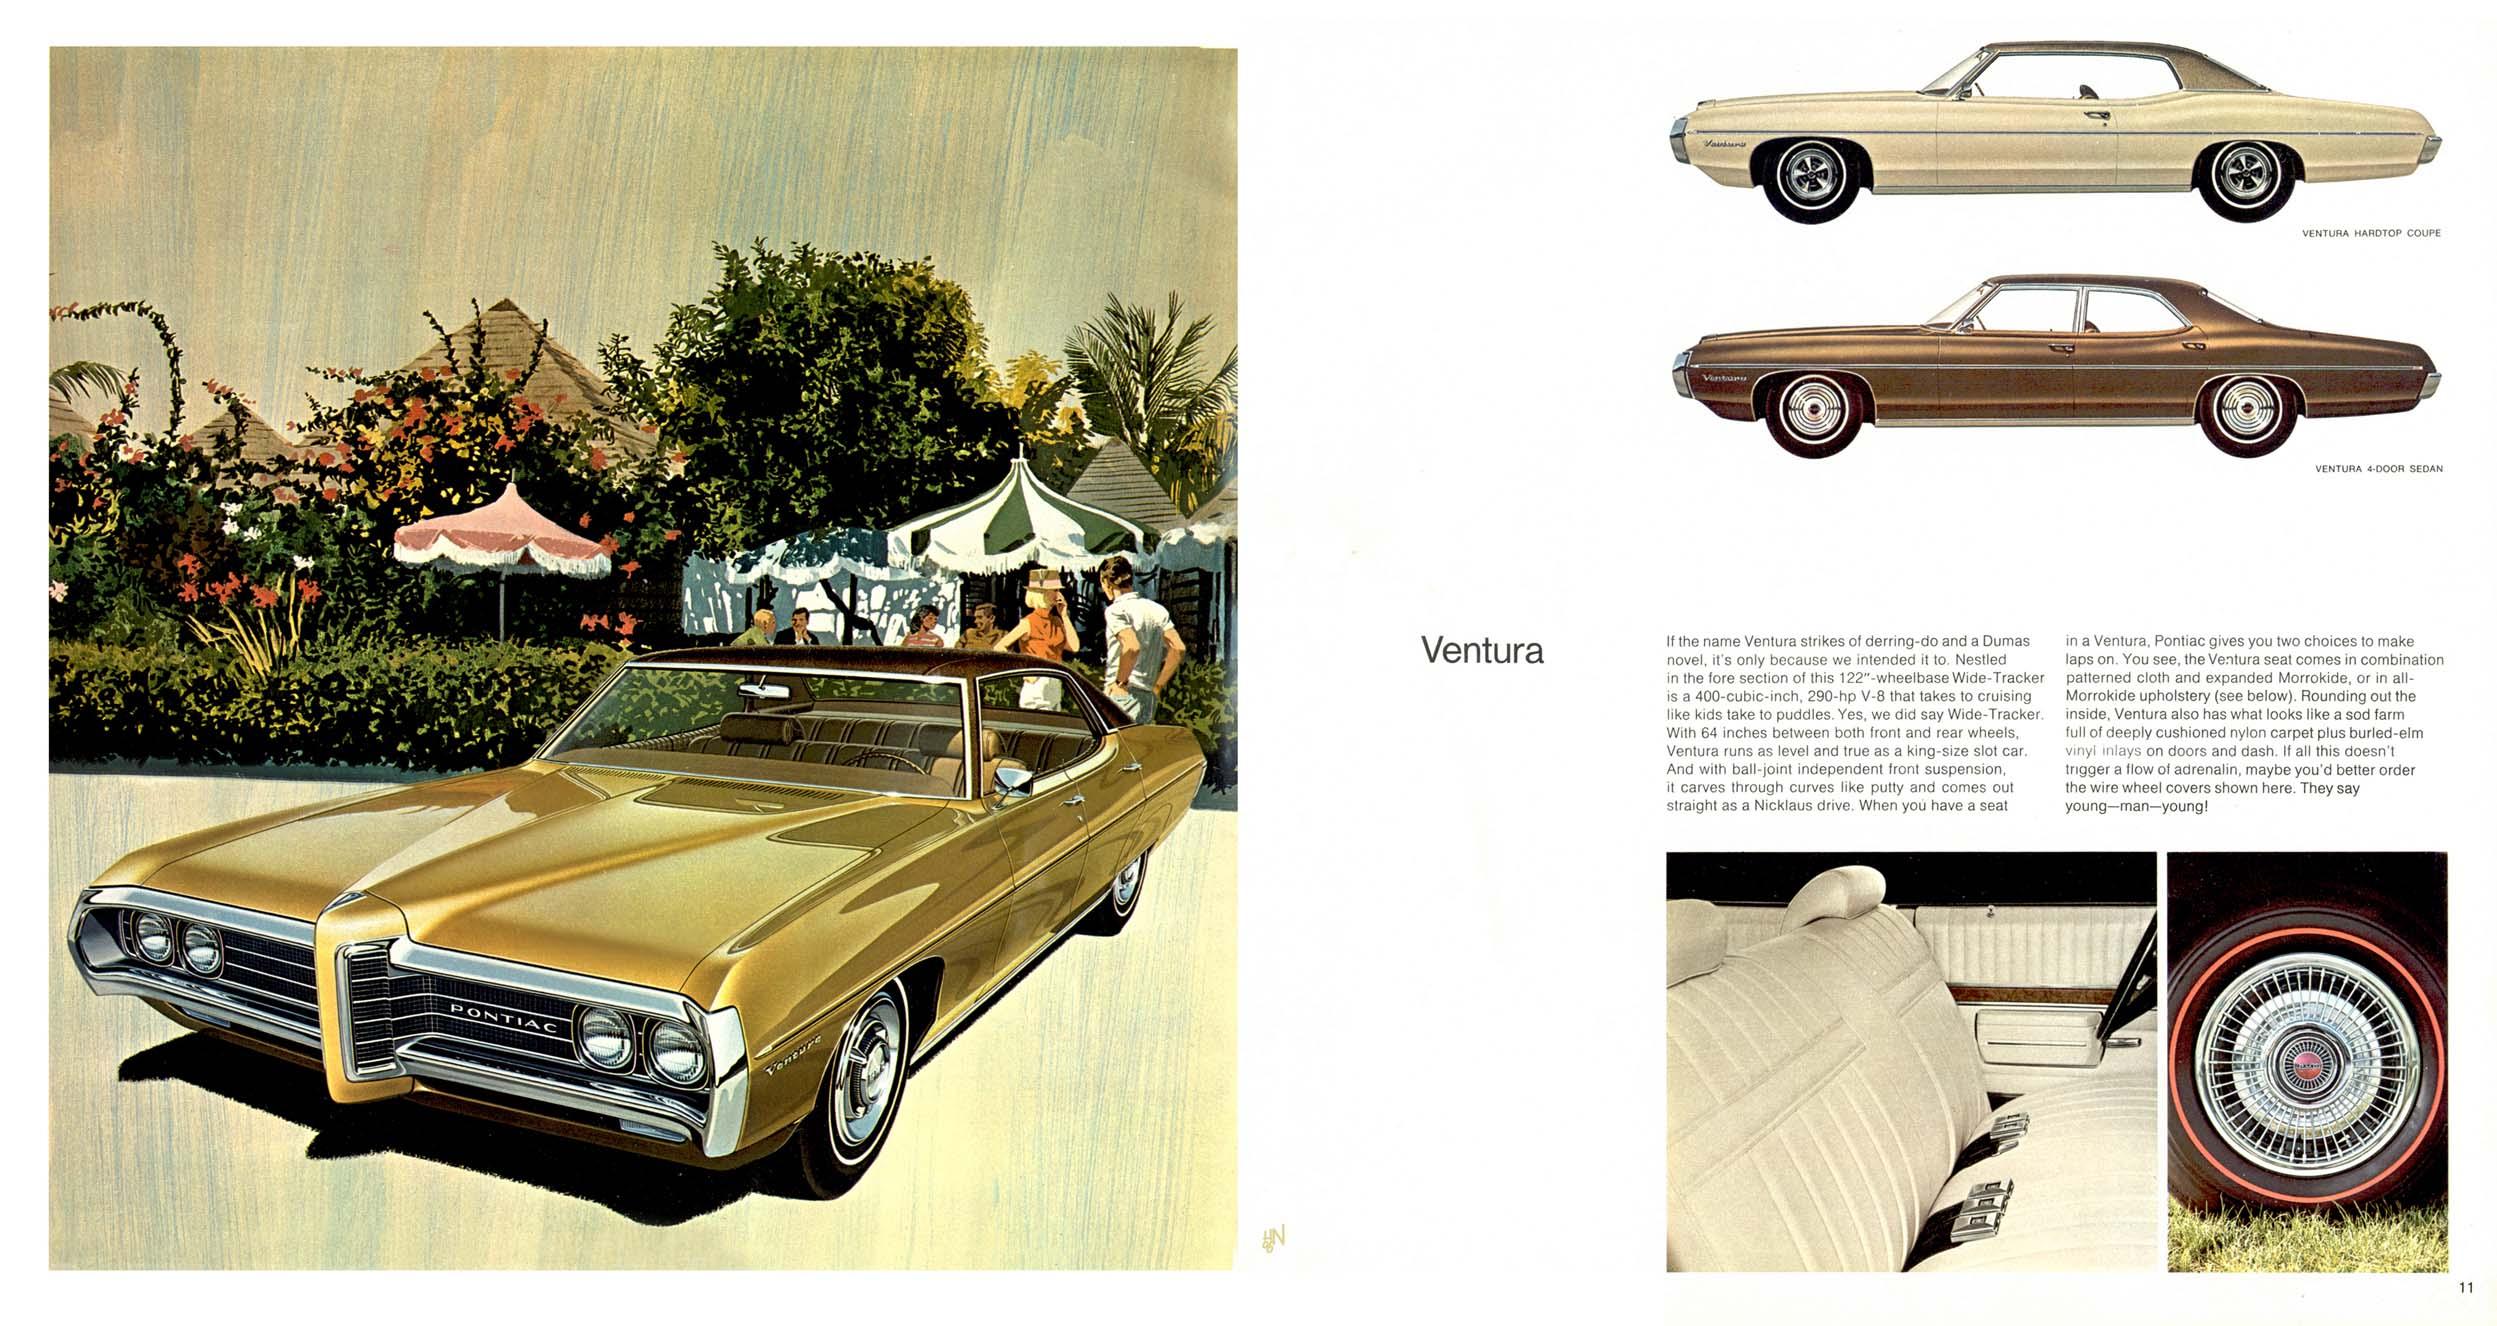 Pontiac Ventura pullin the wheels | Pontiac, Olds and Buick ...